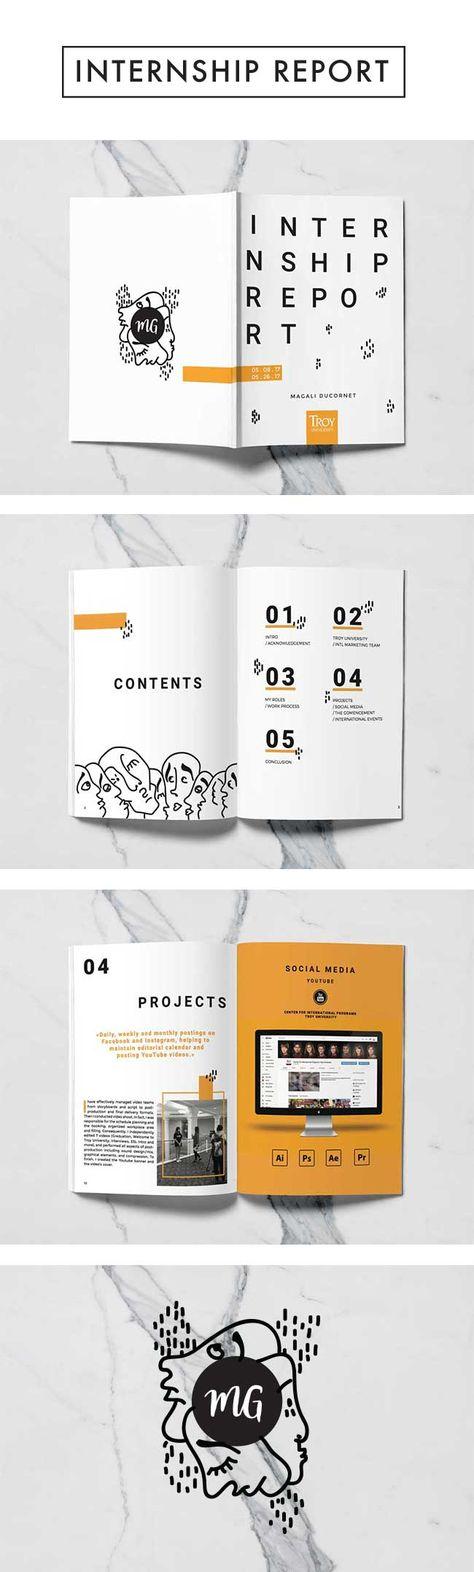 Magali Ducornet x MG x Internship Report x Rapport de Stage x Graphic Design x Art x Marketing x Layout x Mise en Page x Cover